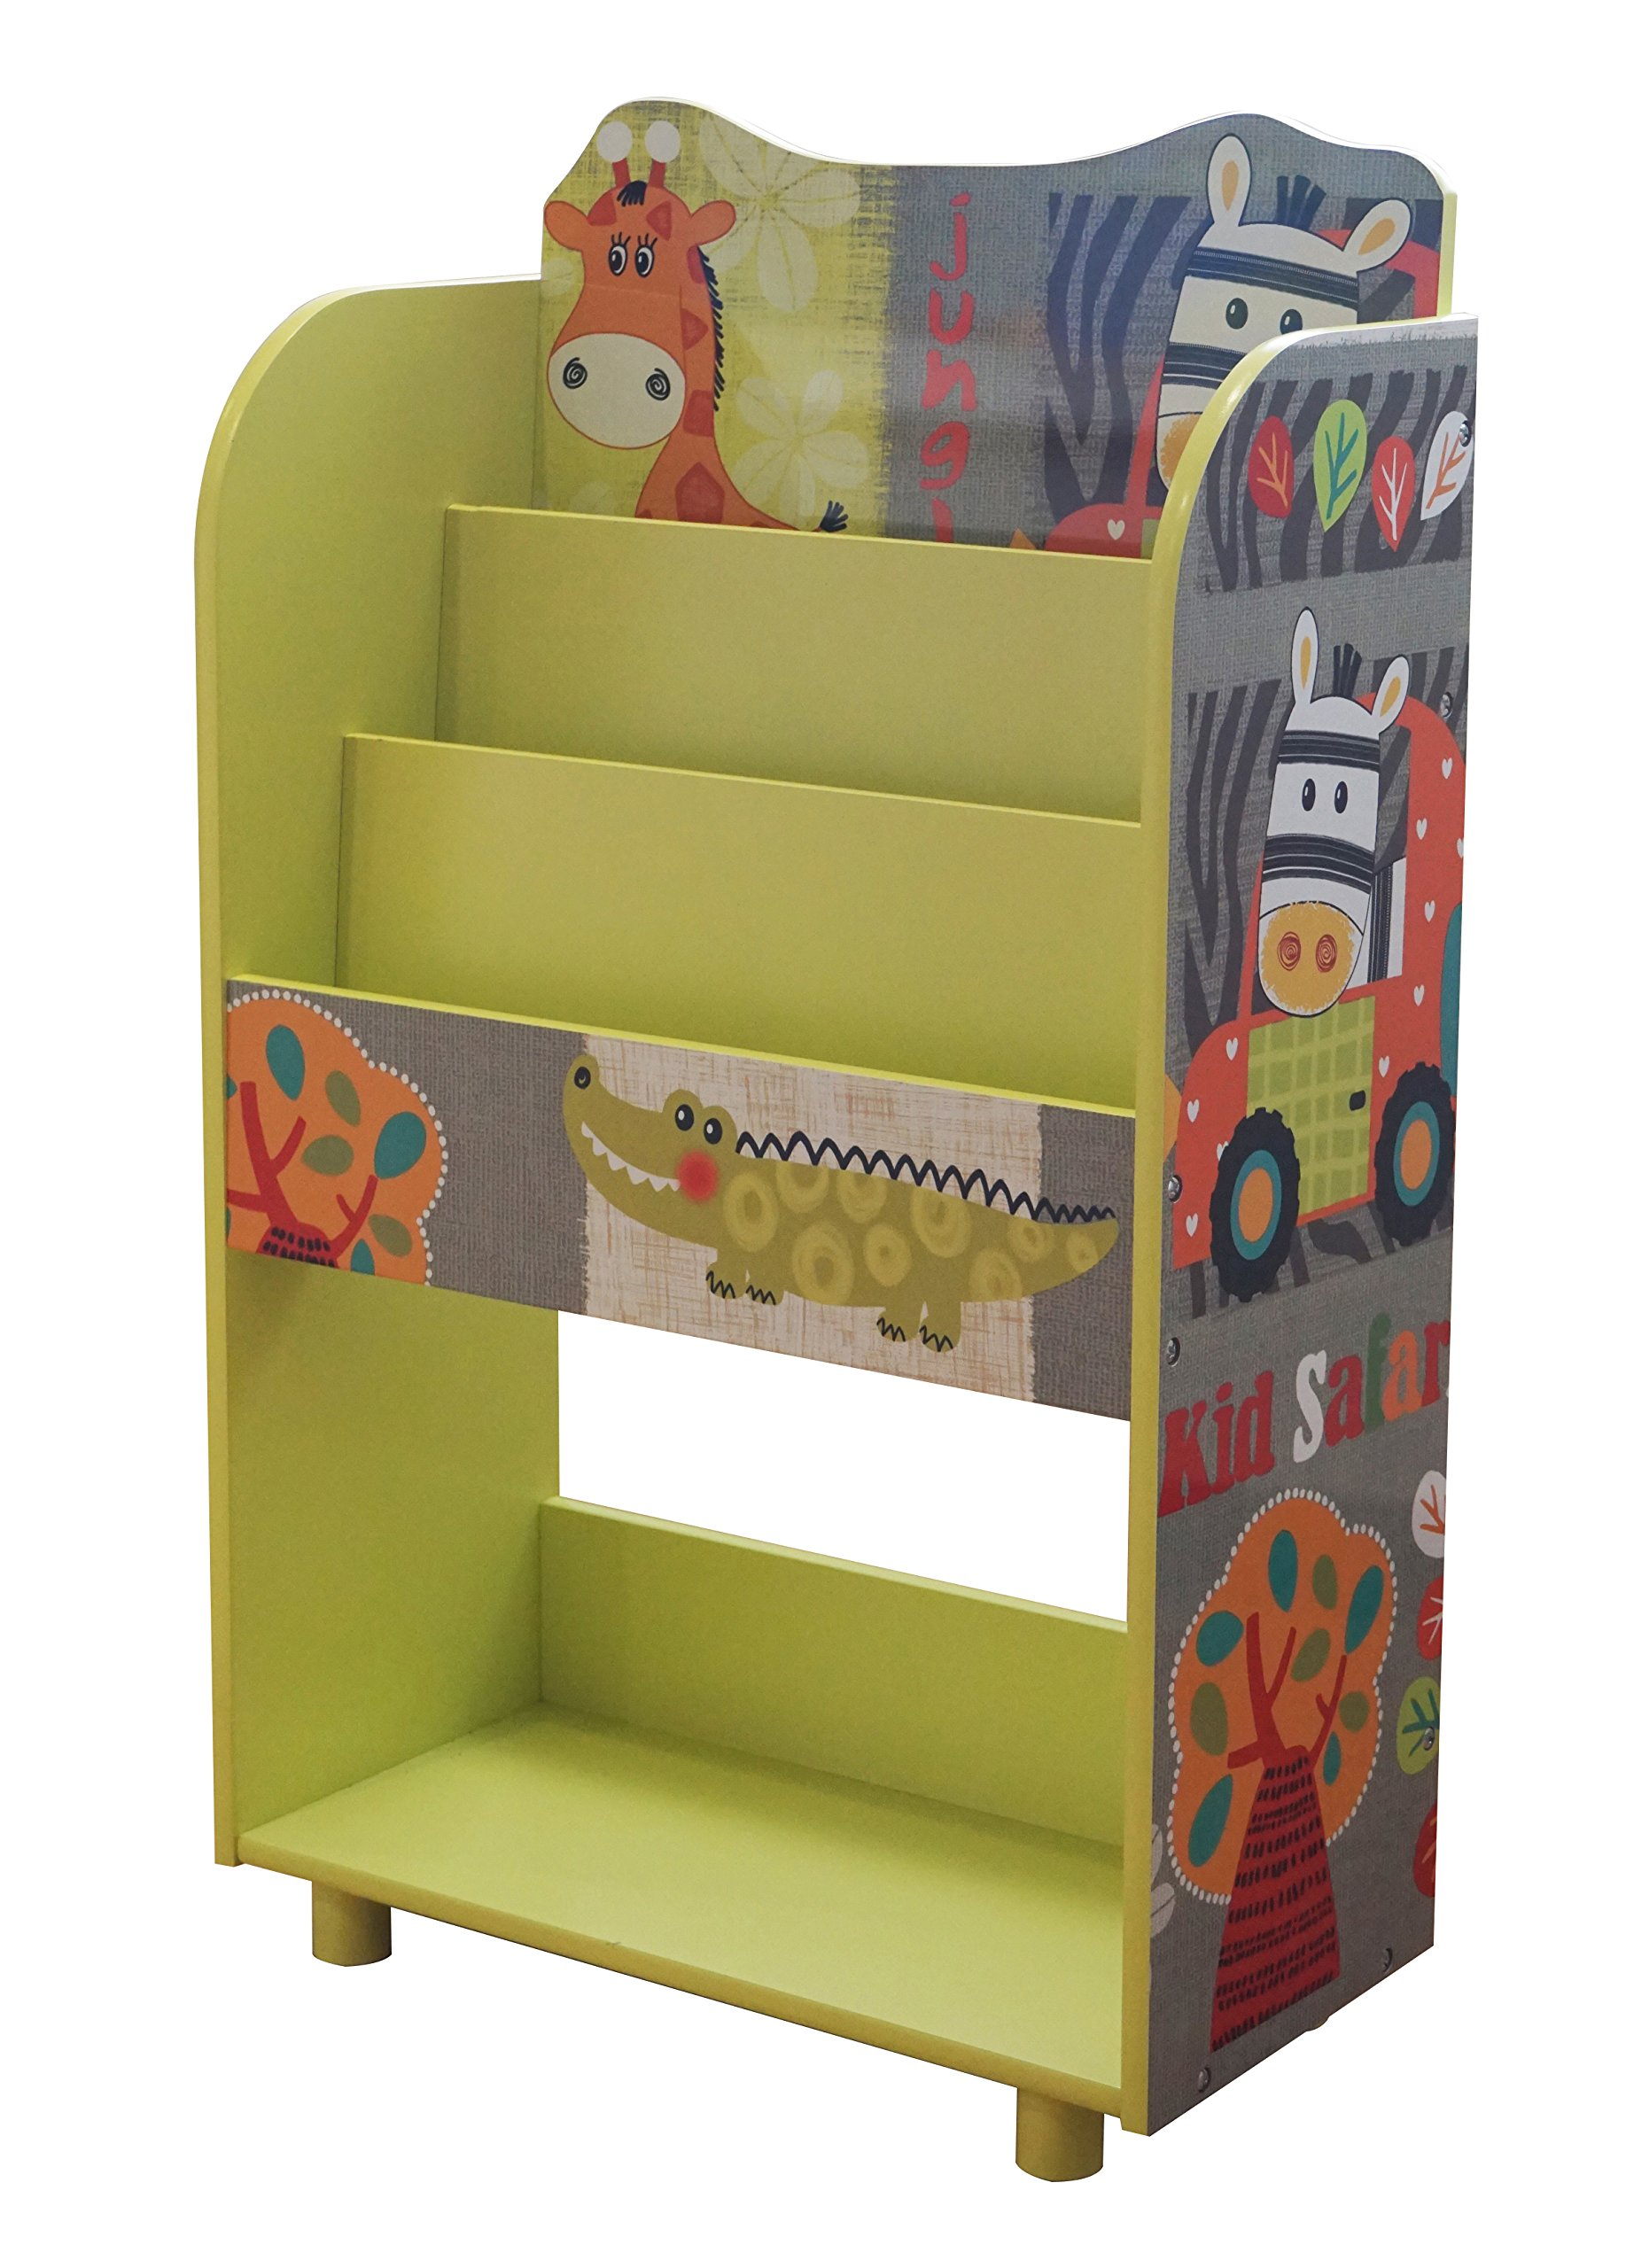 Liberty House Toys TF4802 Kid Safari Book Shelf, Multi-Coloured, H96.5 x W48.5 x D24cm